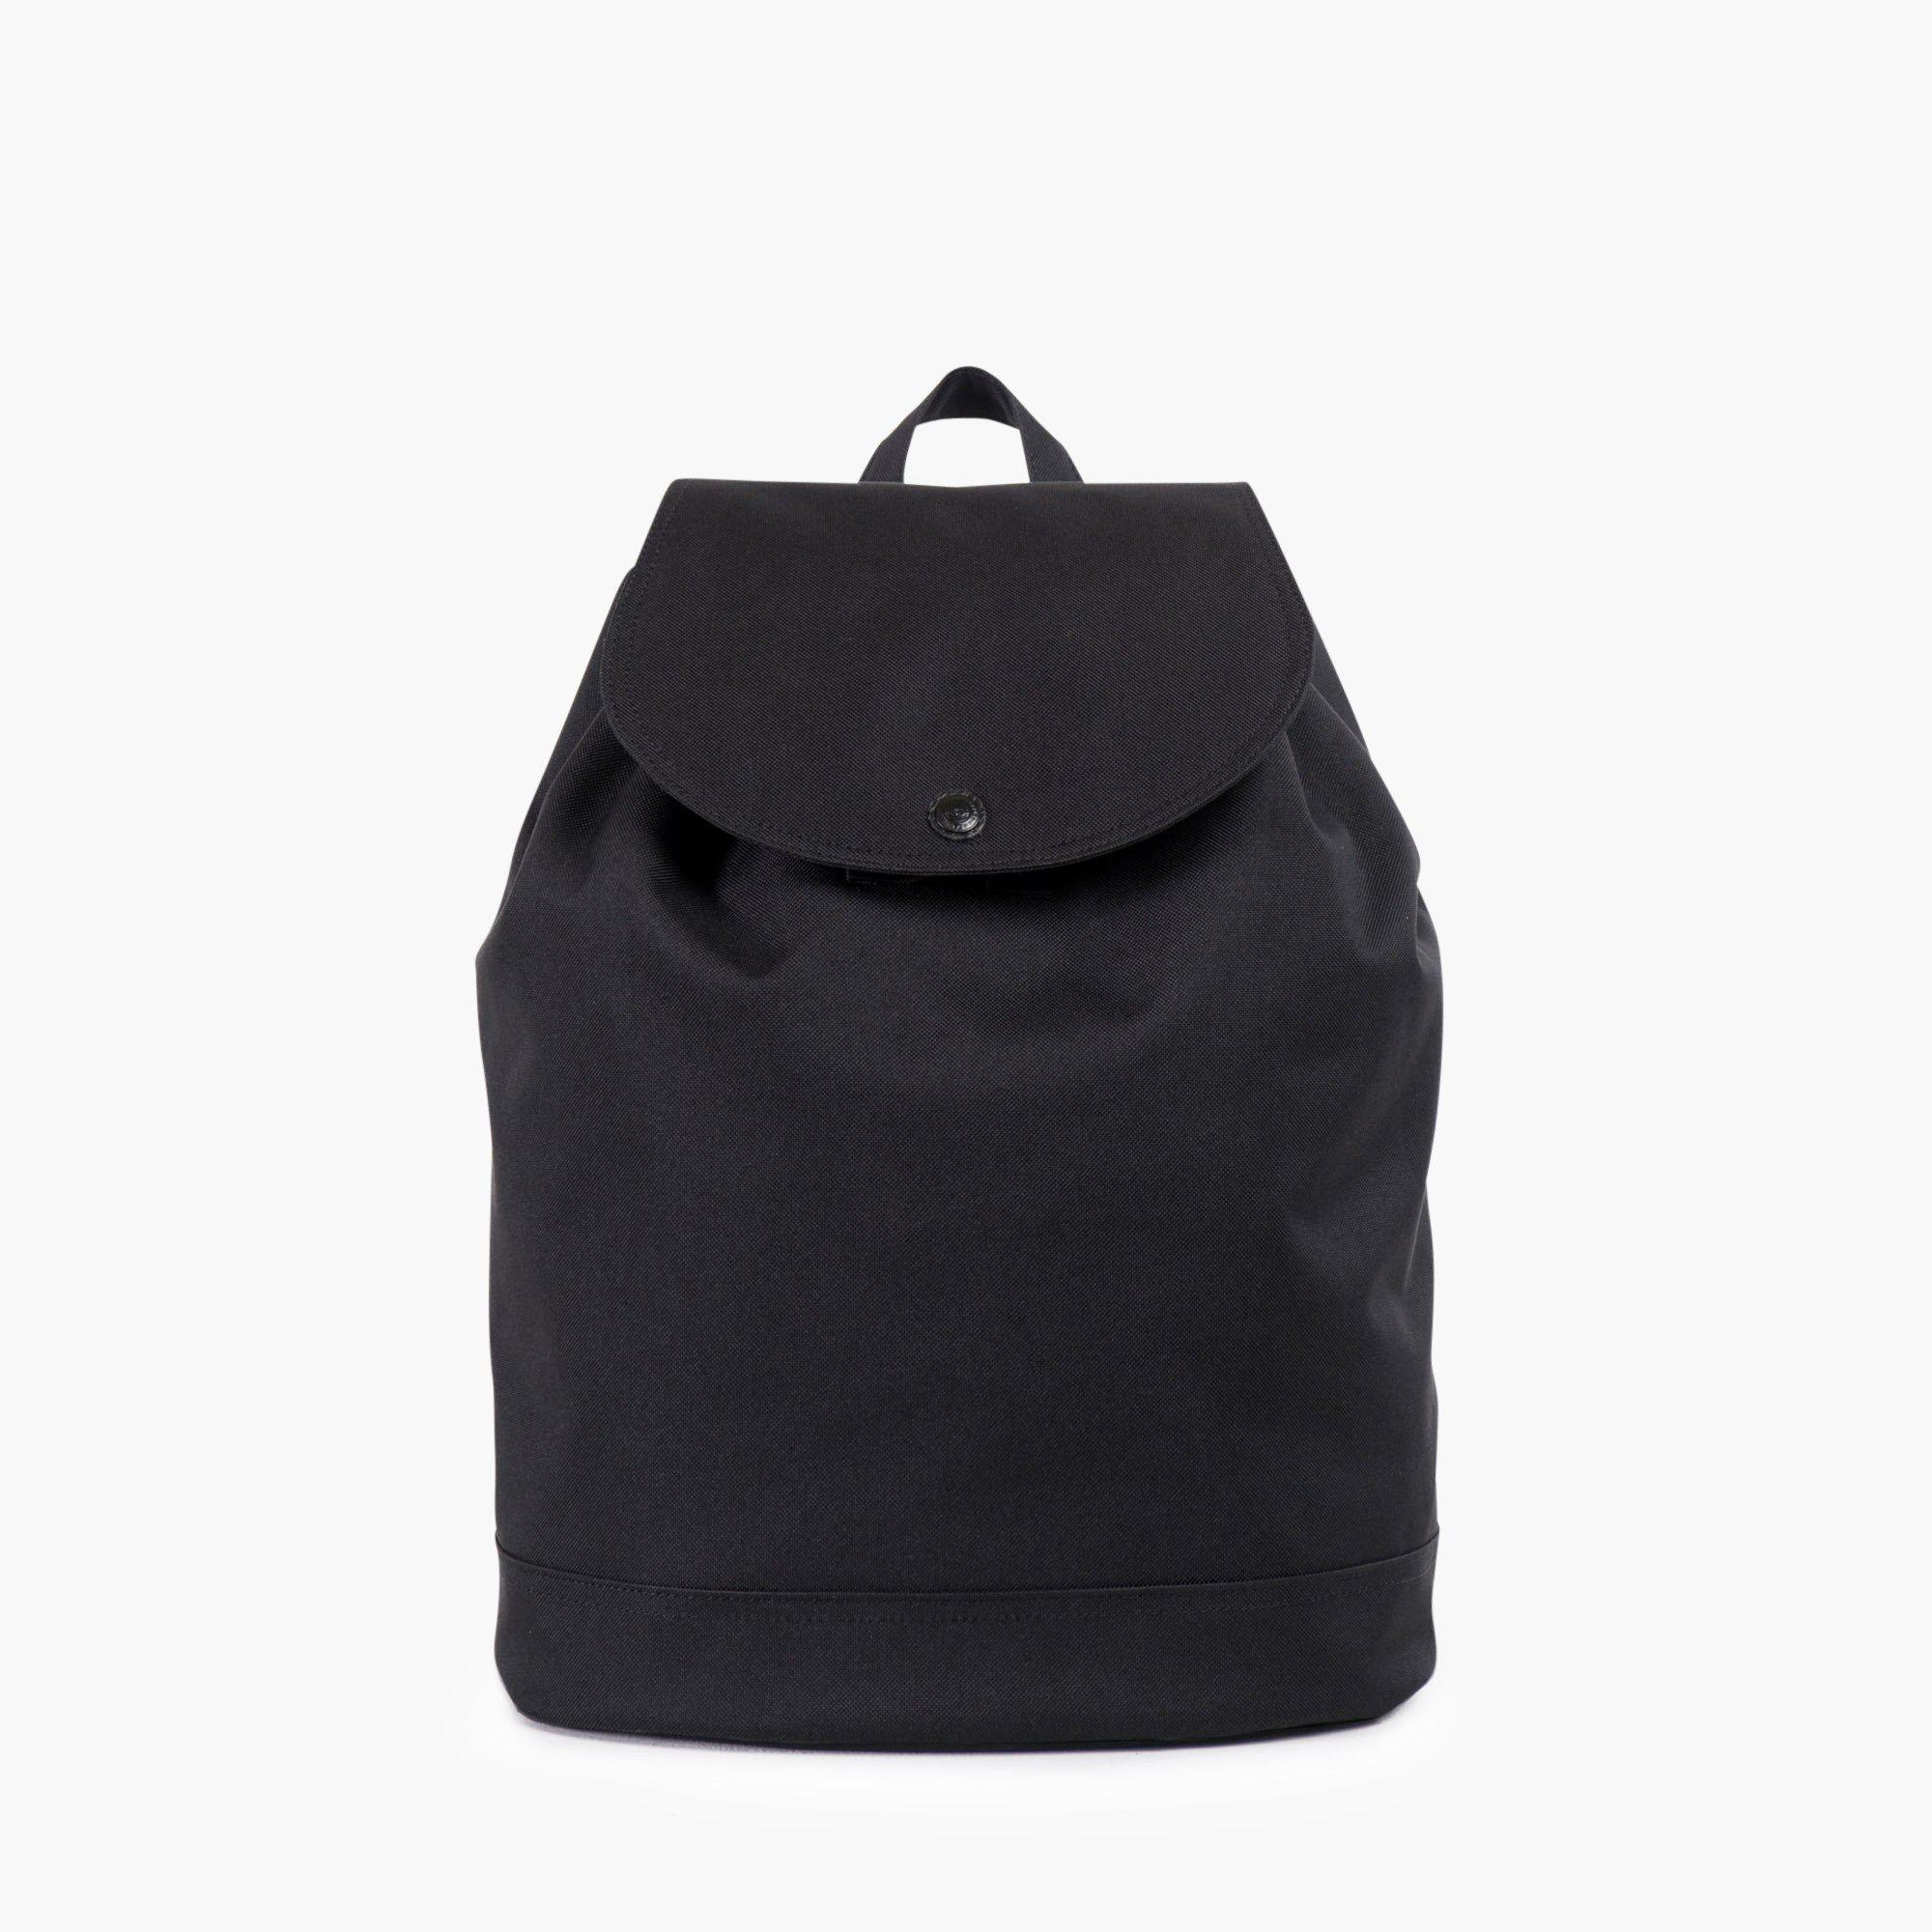 21f7fdbbe9 Herschel Supply Co. Women s Reid Backpack Classics